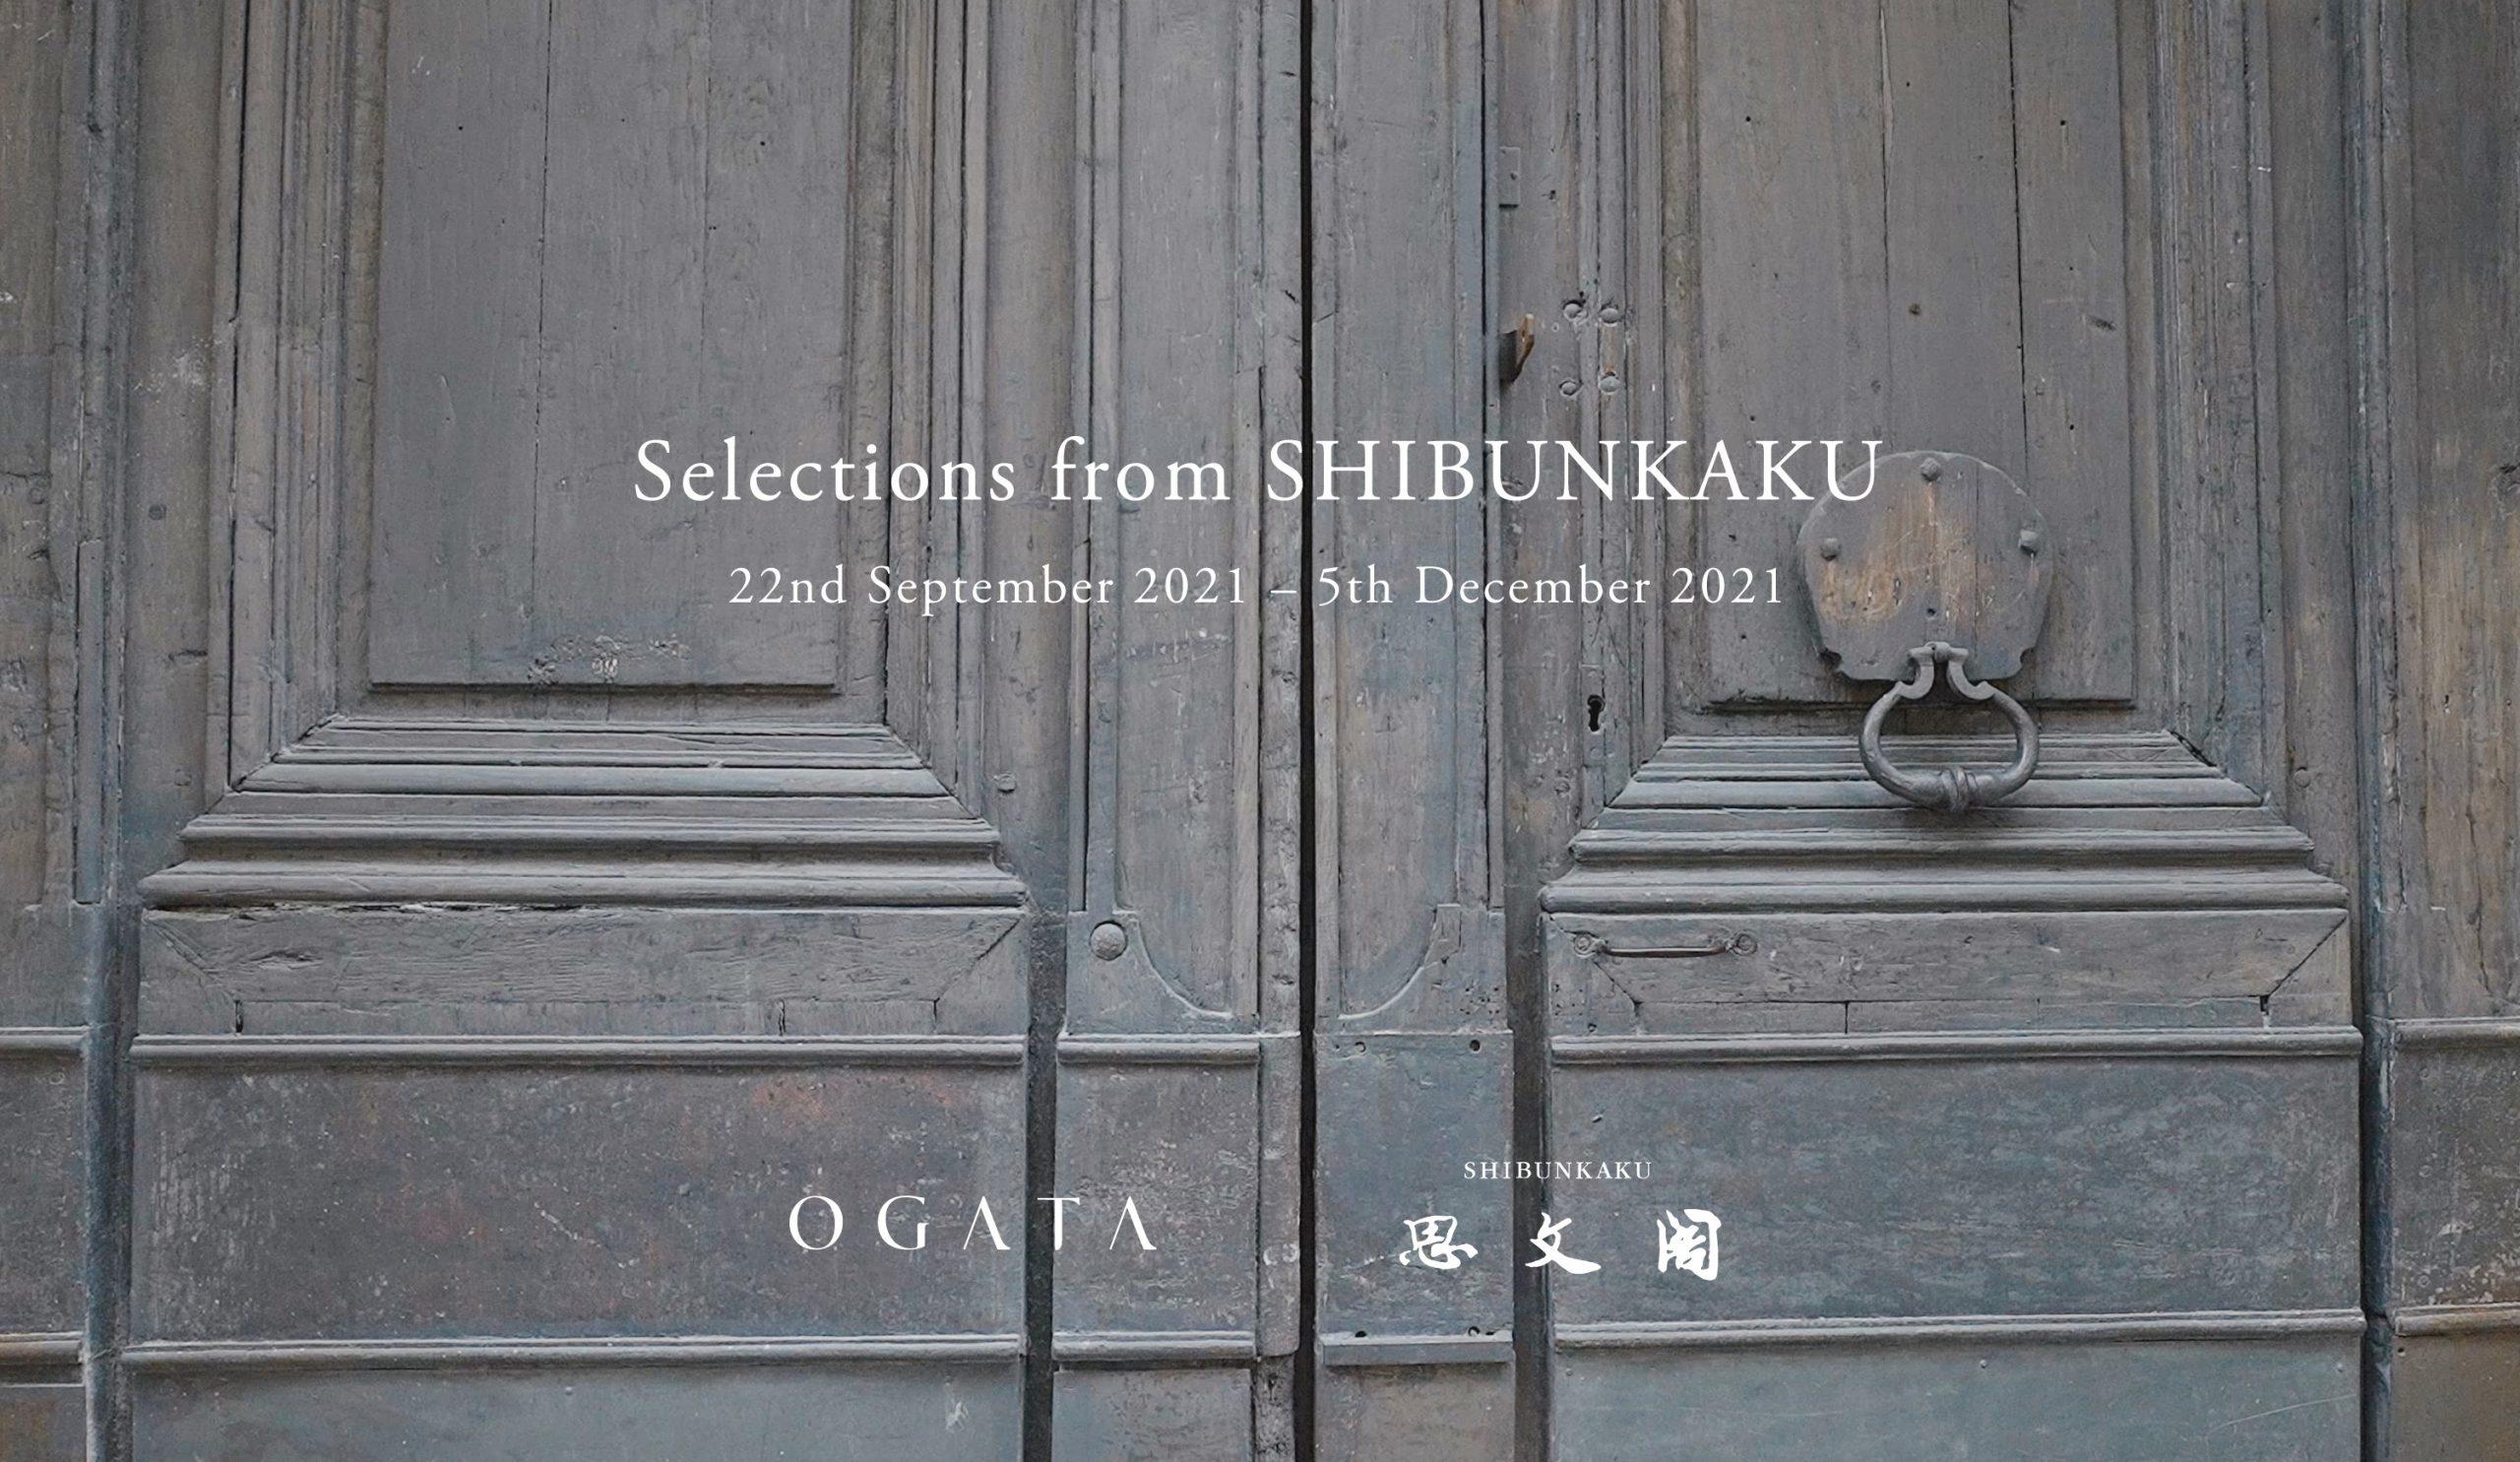 Private Viewing Space in Paris & Galerie OGATA Paris | Selections from Shibunkaku Announcement